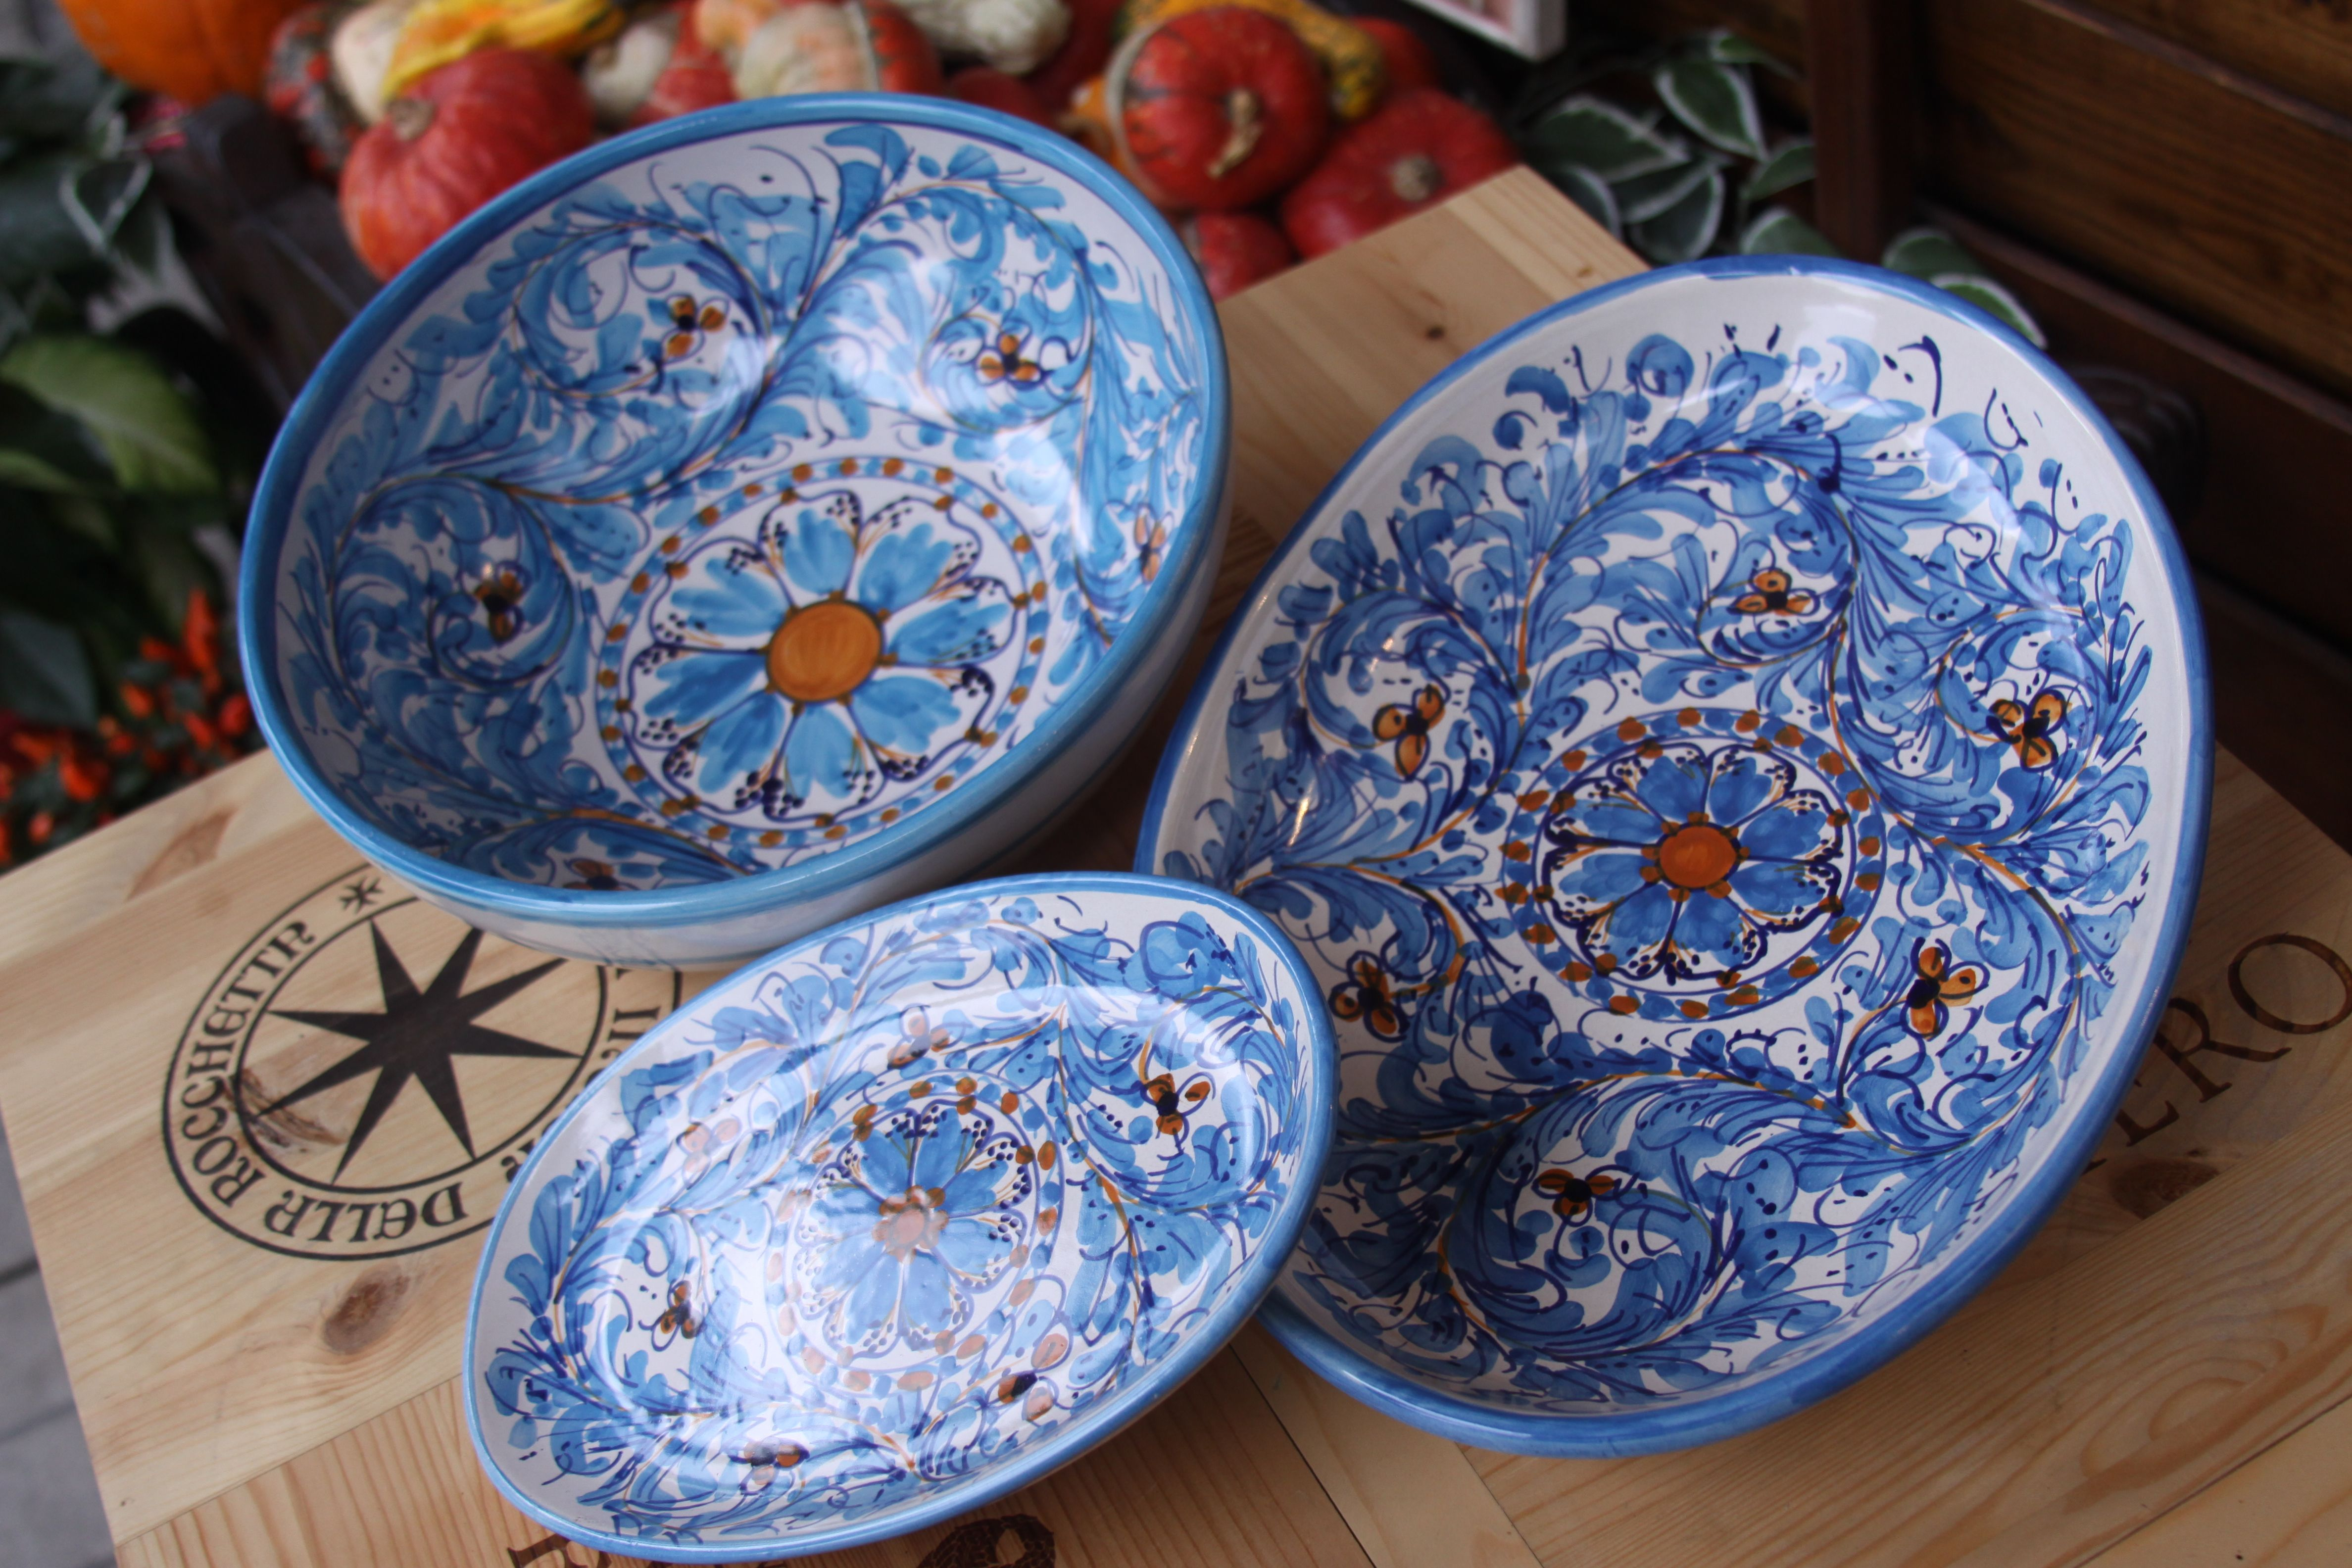 Sicilian & Sicilian Maiolica at Conti Tuscany Flavours ... Hand made in Sicily ...